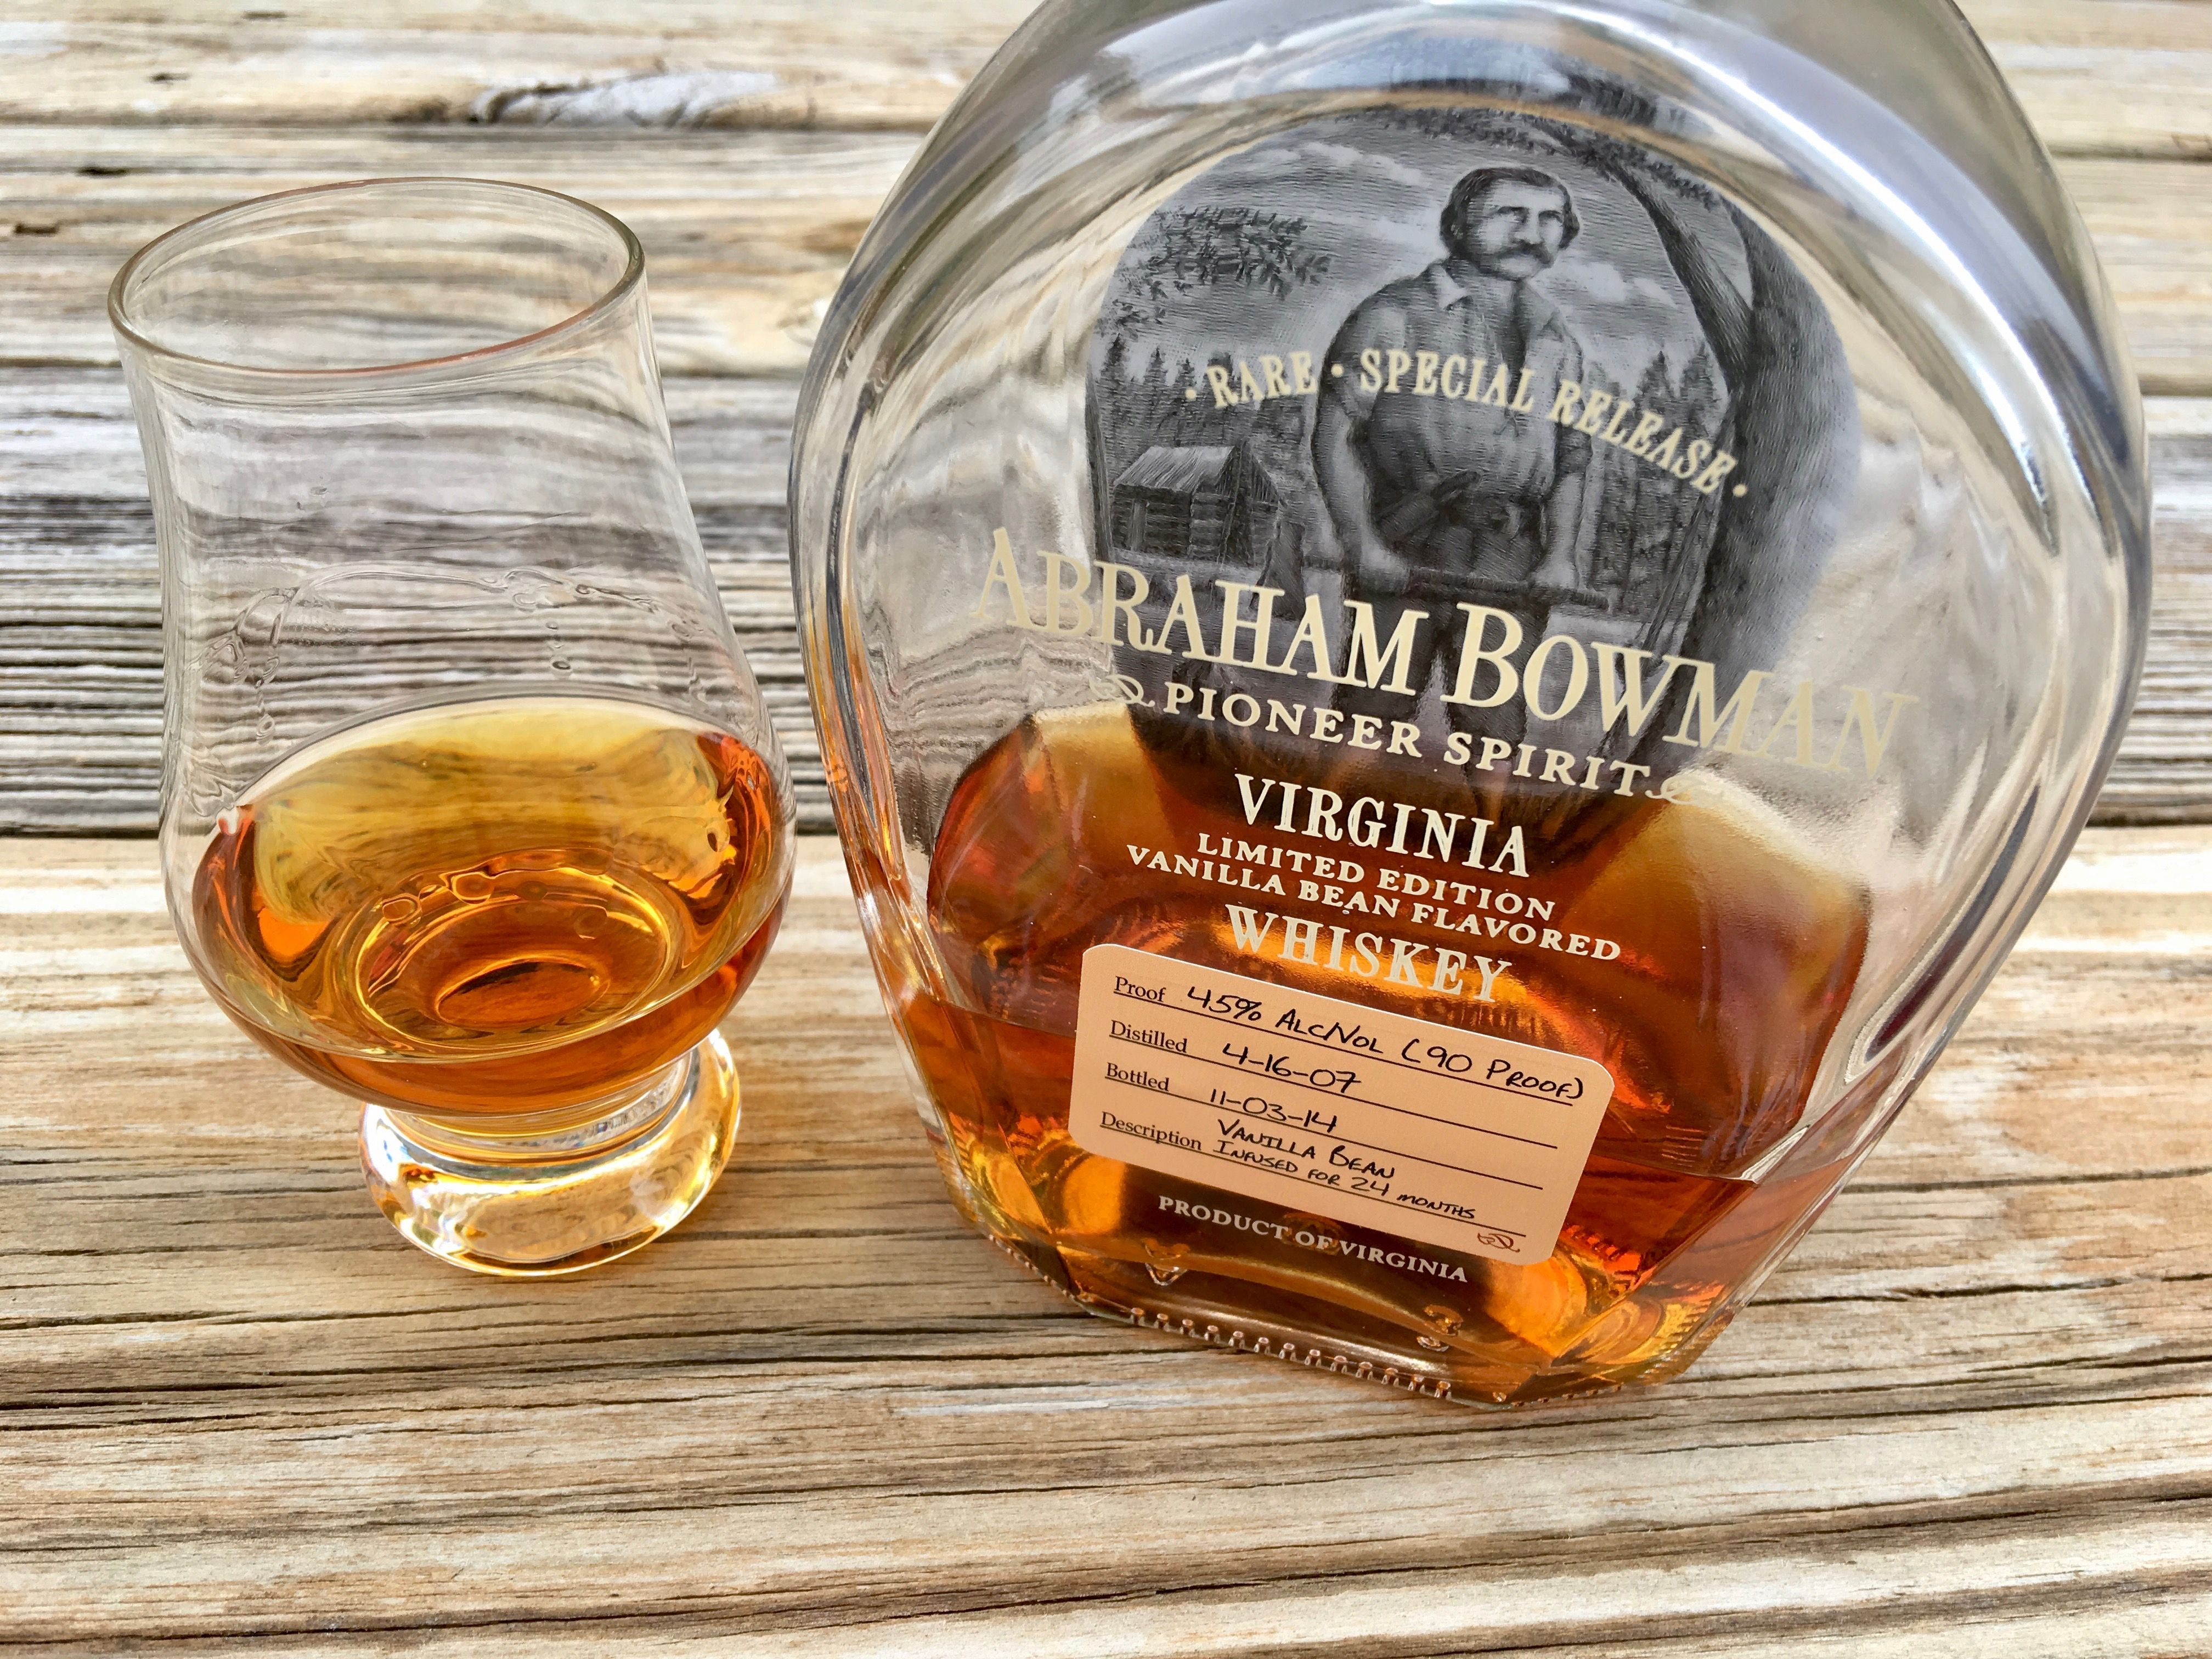 Review #182: Abraham Bowman Vanilla Bean Flavored Whiskey #bourbon #whiskey #whisky #scotch #Kentucky #JimBeam #malt #pappy